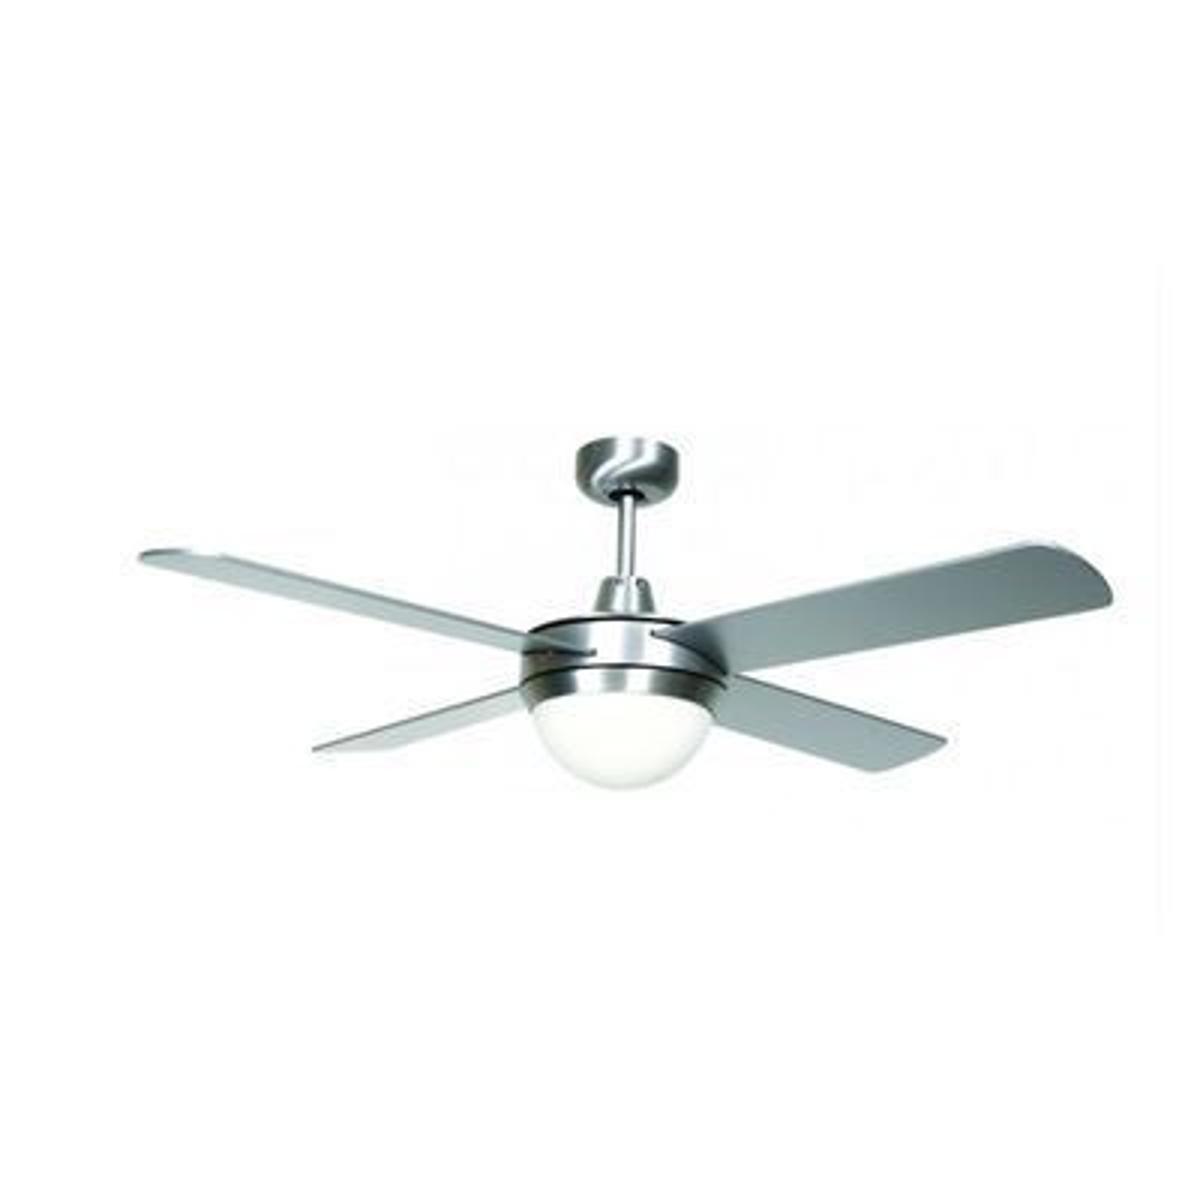 Ventilateur de plafond Futura Eco Chrome brossé 122 cm - LUCCI AIR -